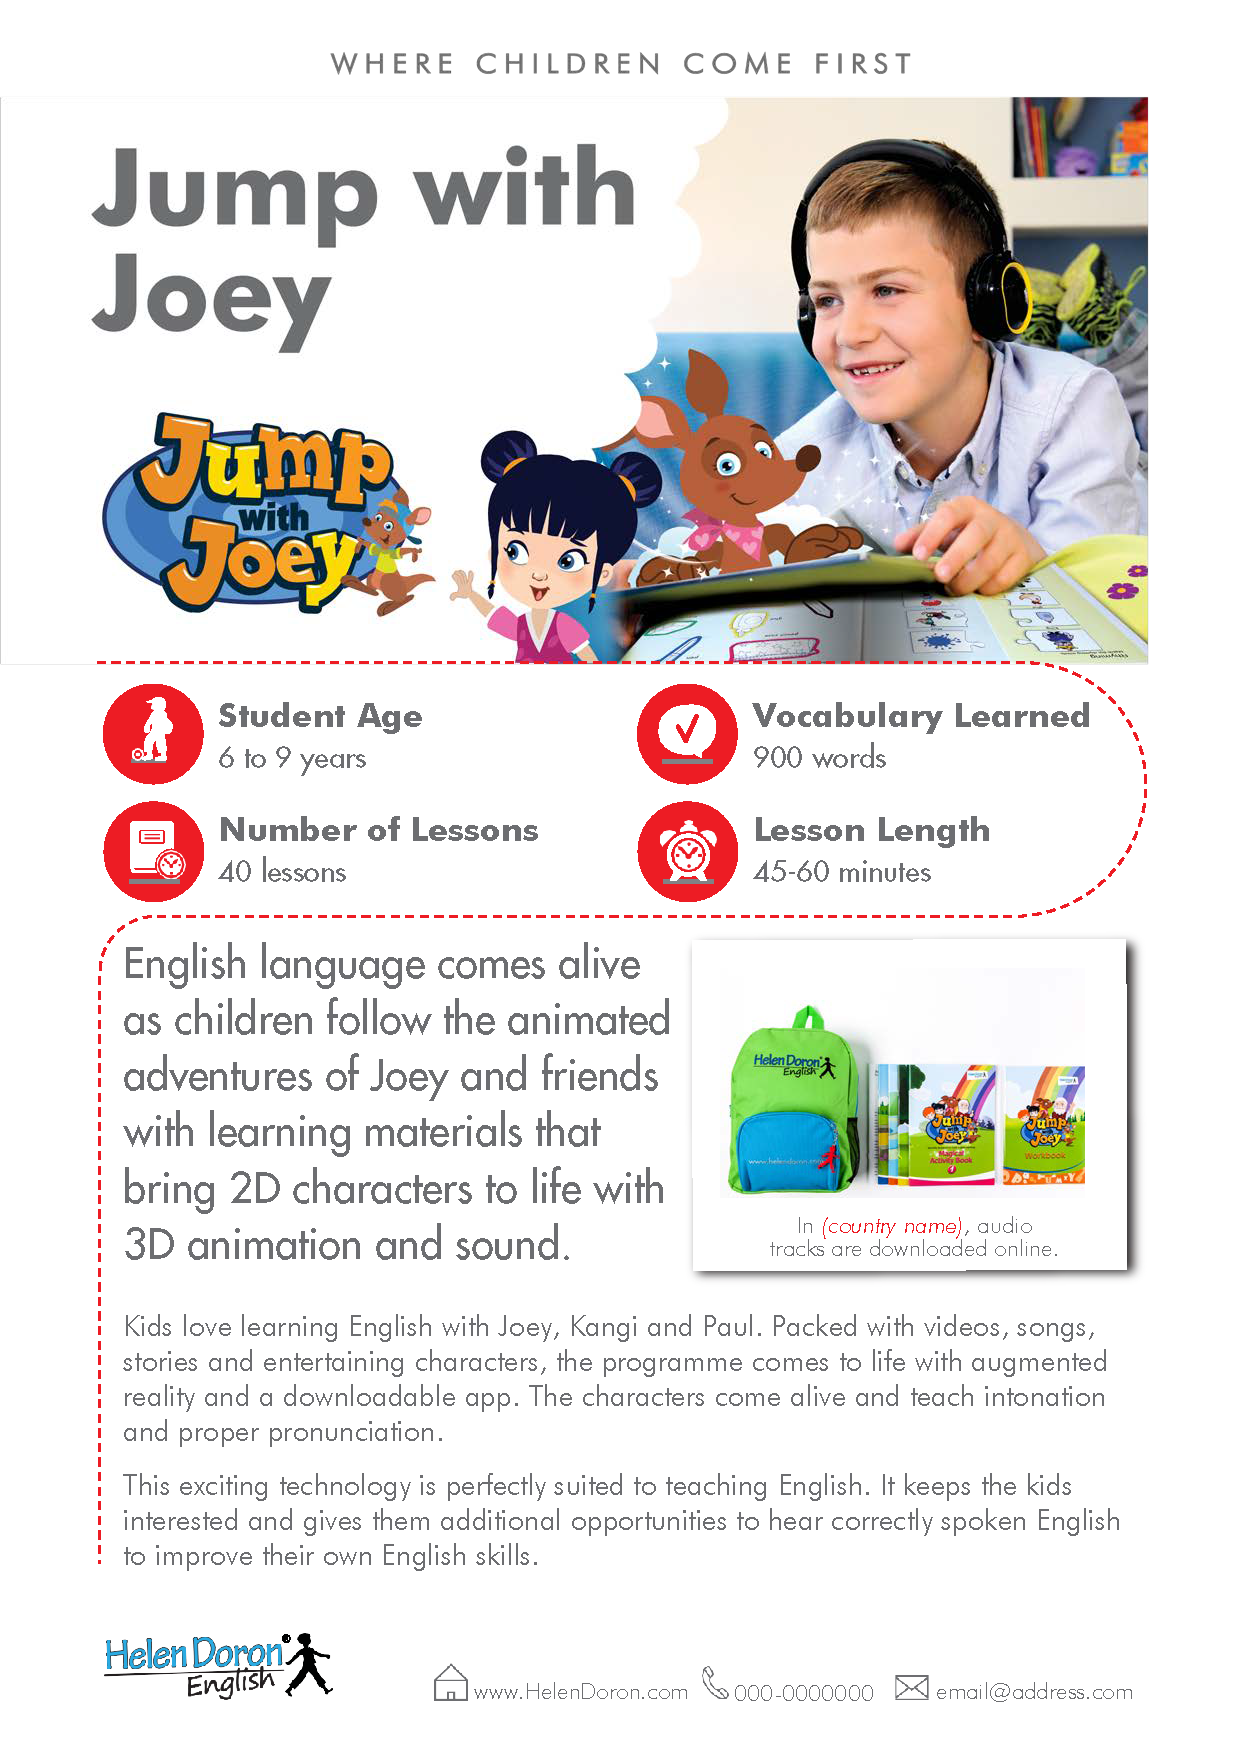 Descargar - Jump with Joey